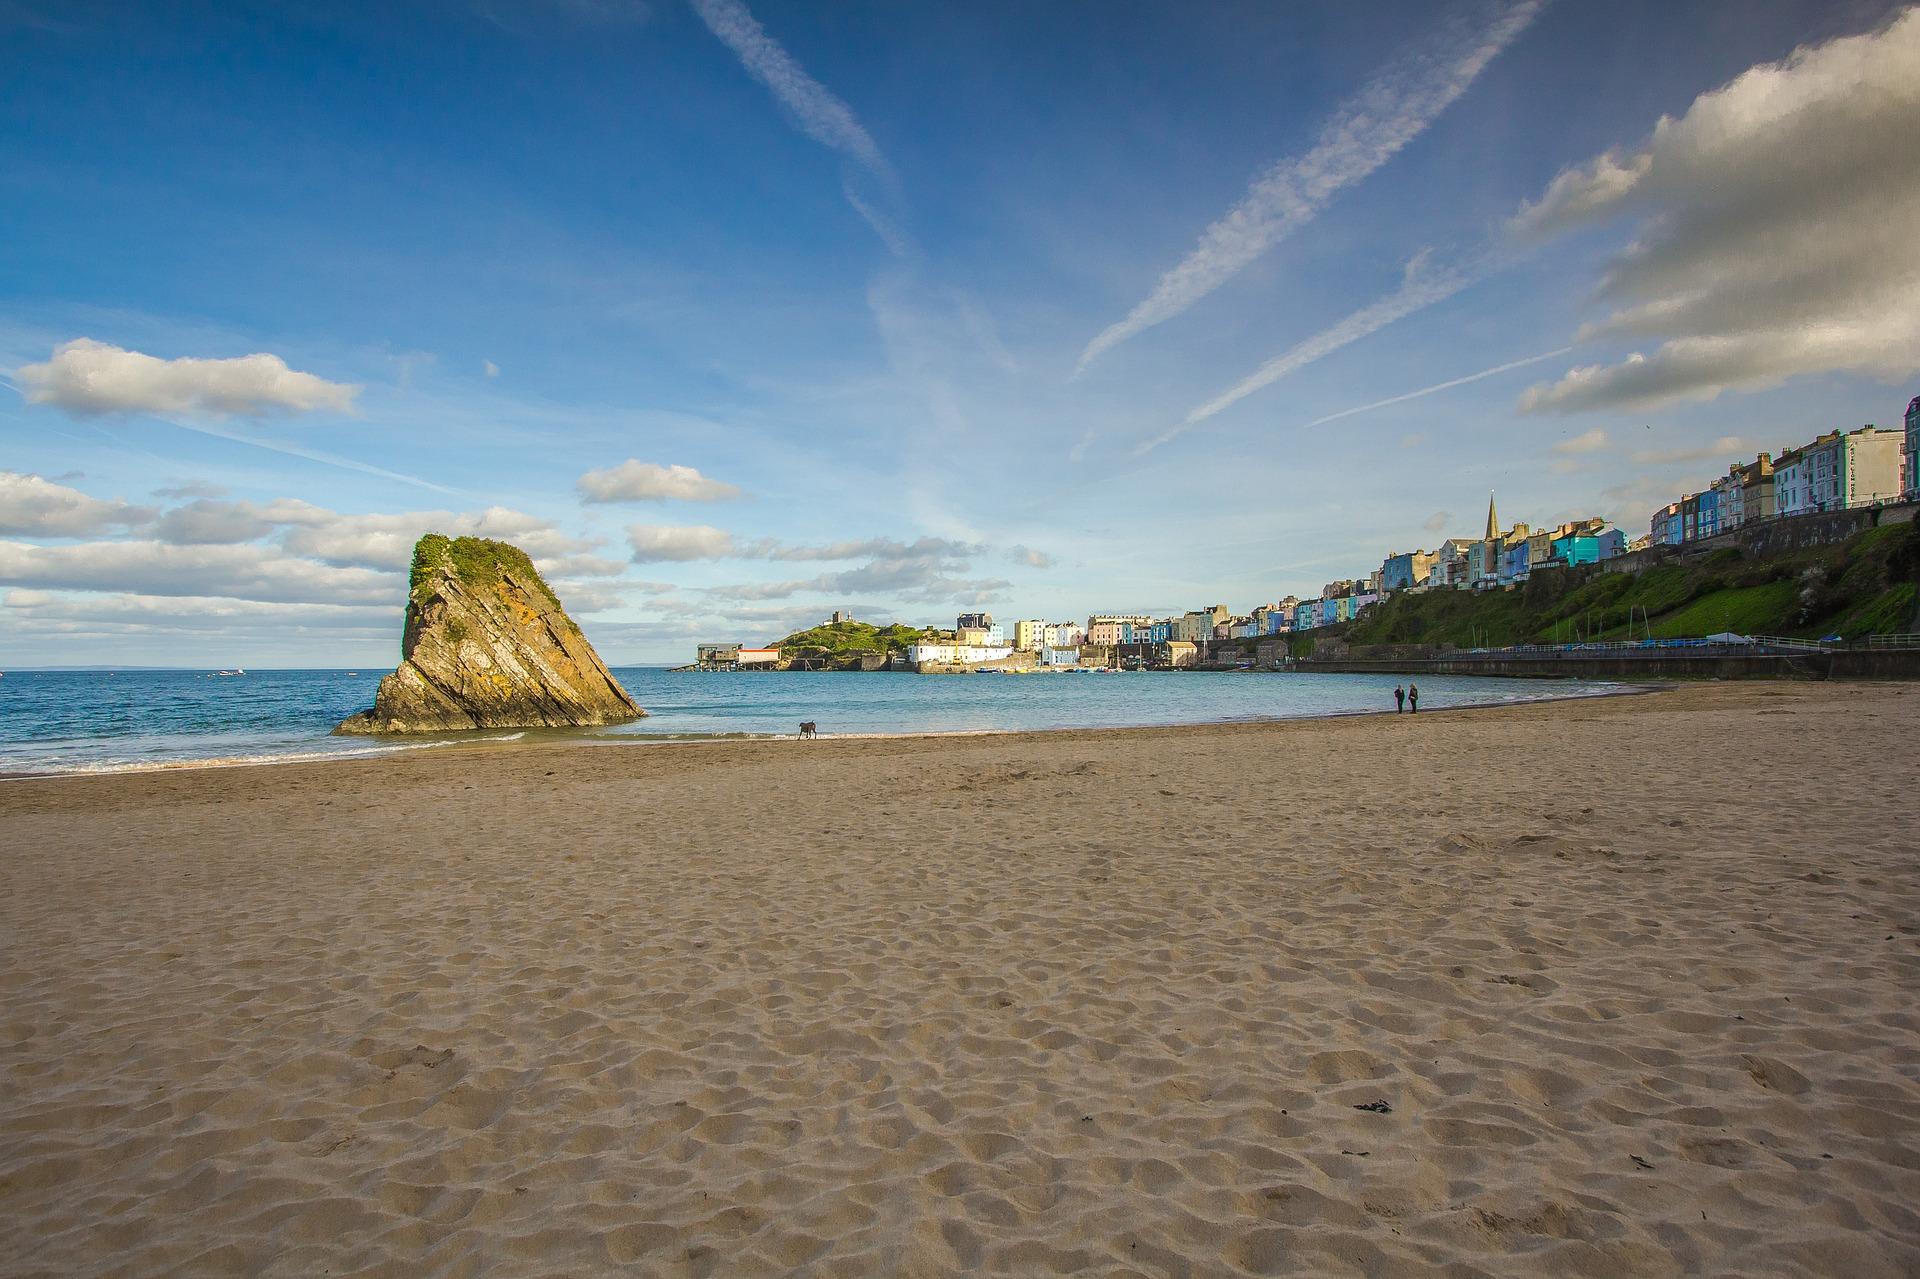 Reise nach Wales 3 Nächte inklusive Rugby Ticket Wales vs. Südafrika - Strand in Wales